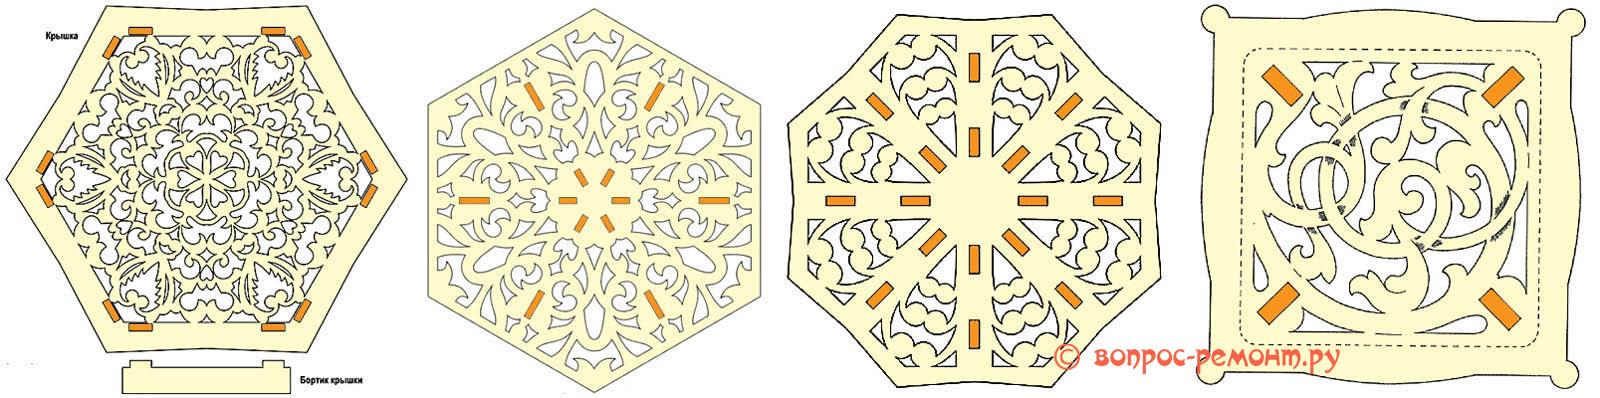 Схемы узоров крышек шкатулок из фанеры